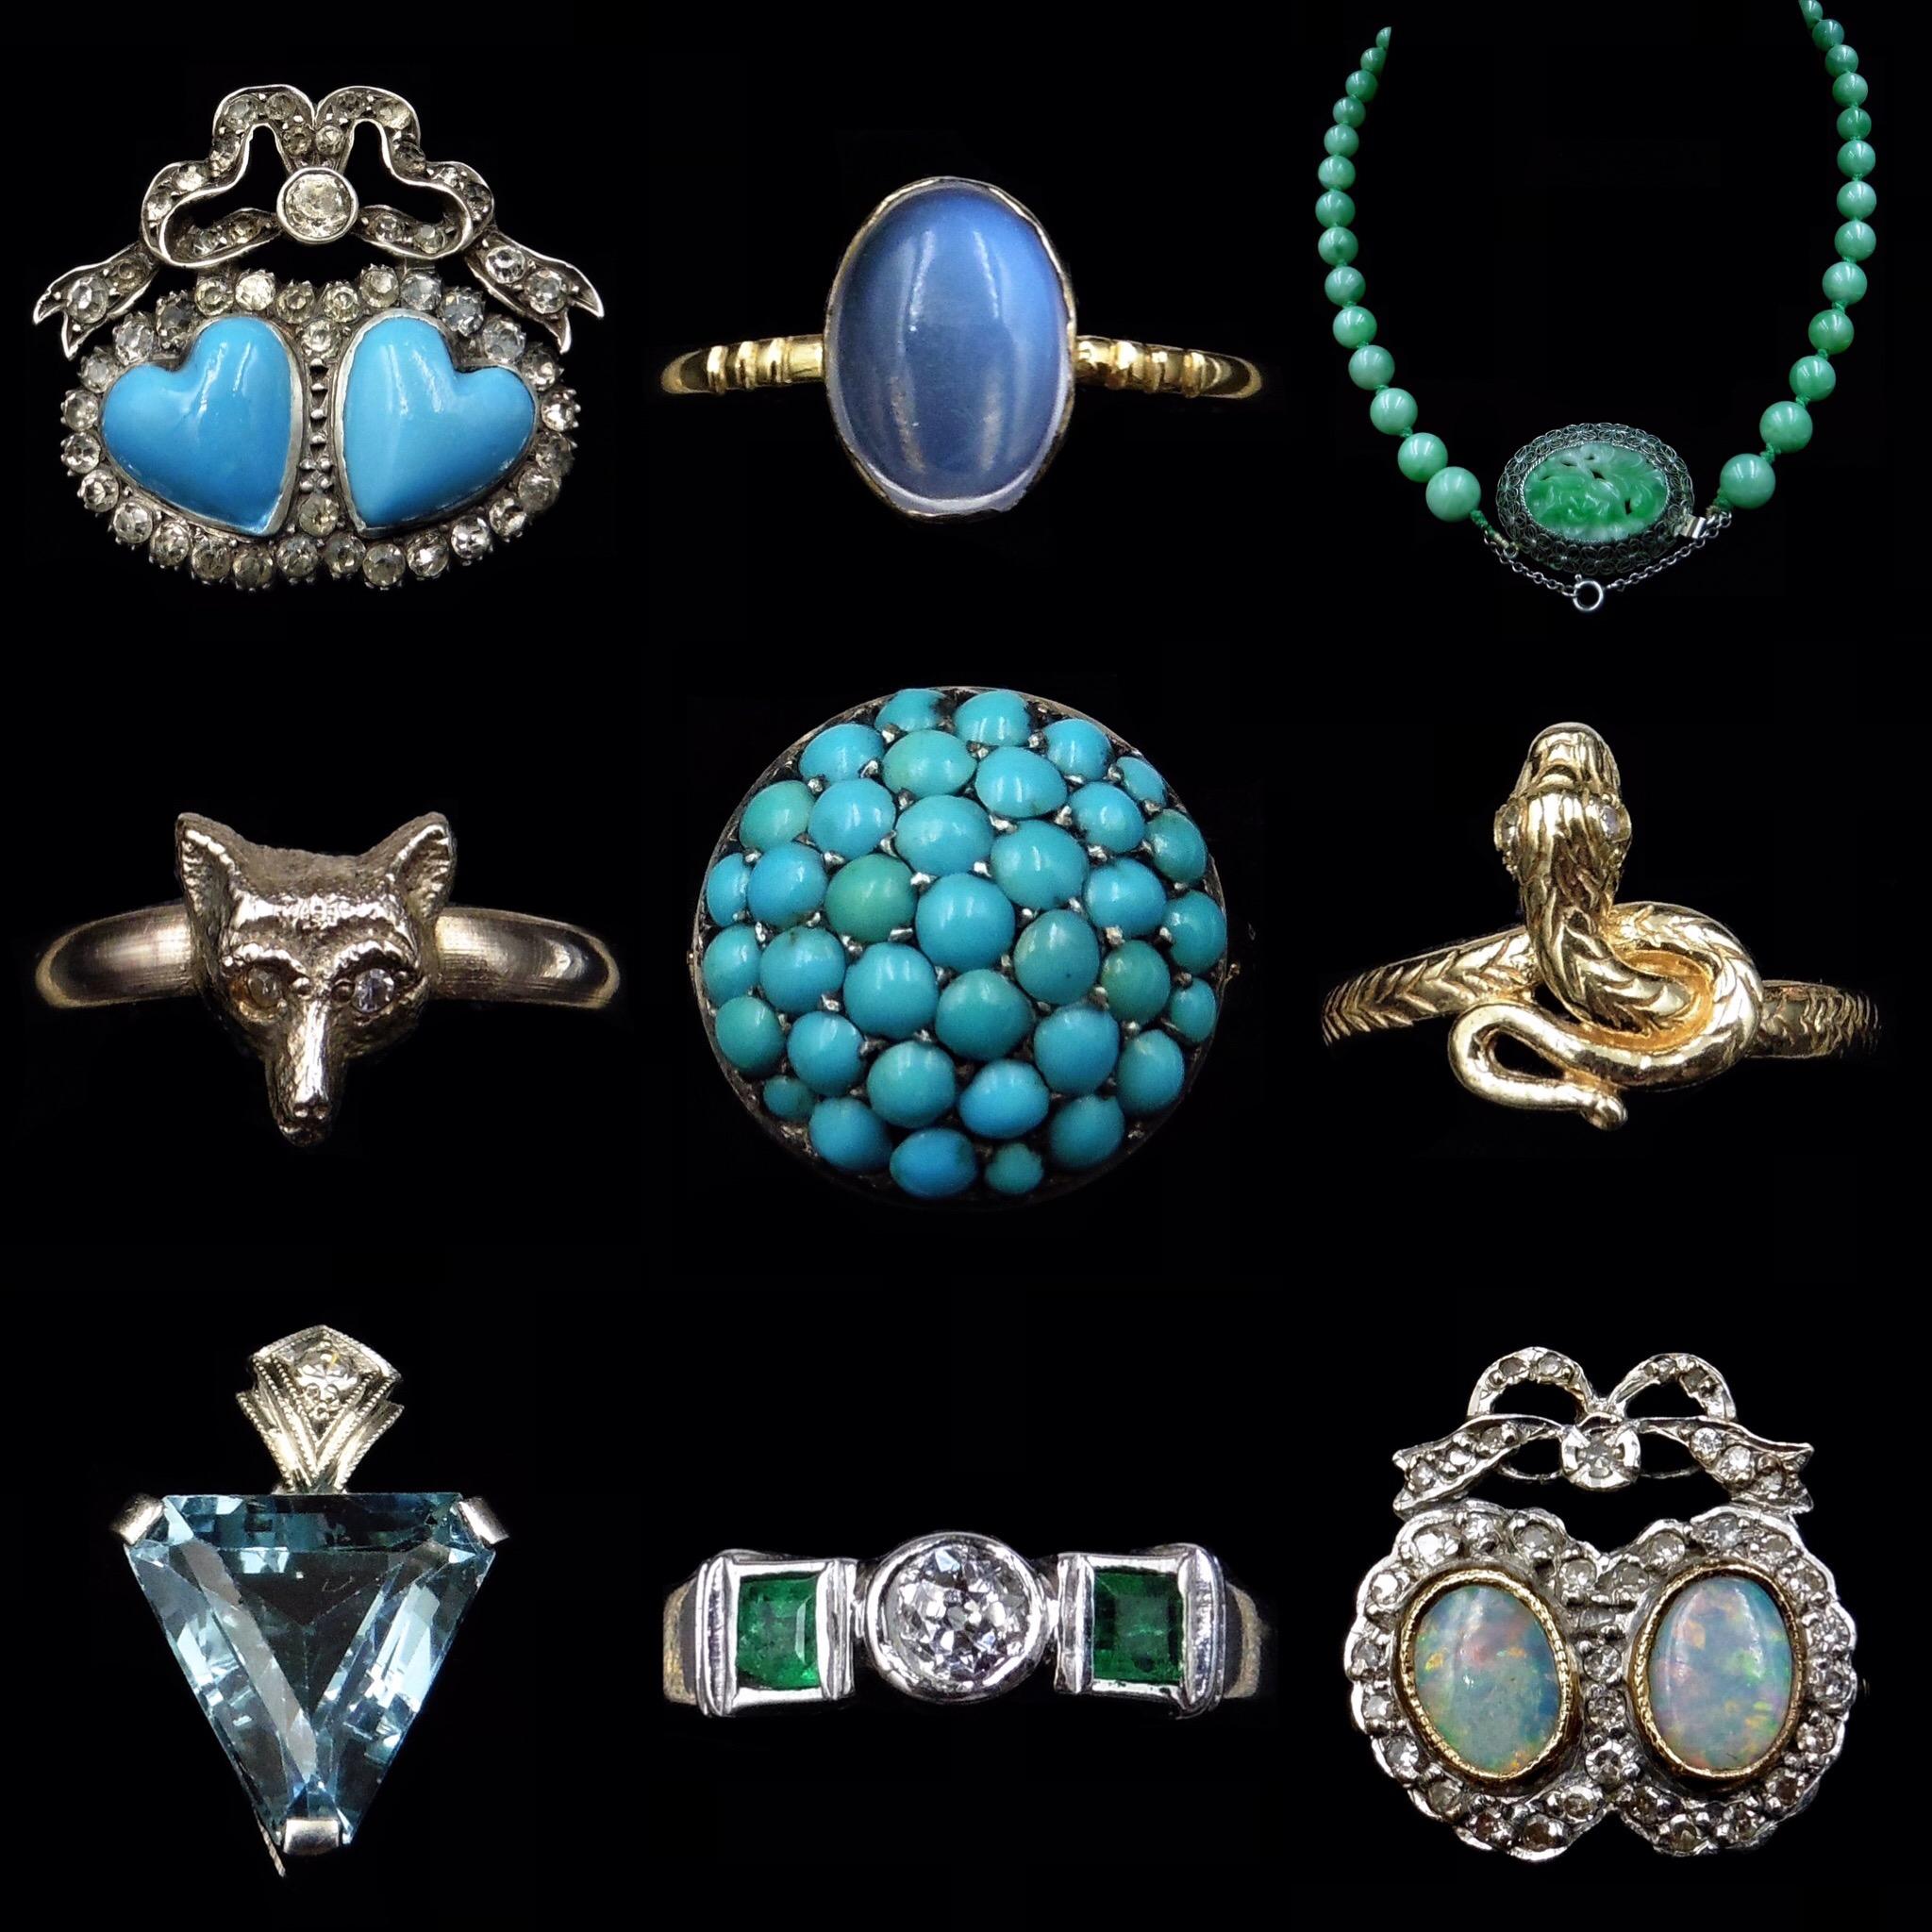 Lancastrian Jewellers image (3 of 6)